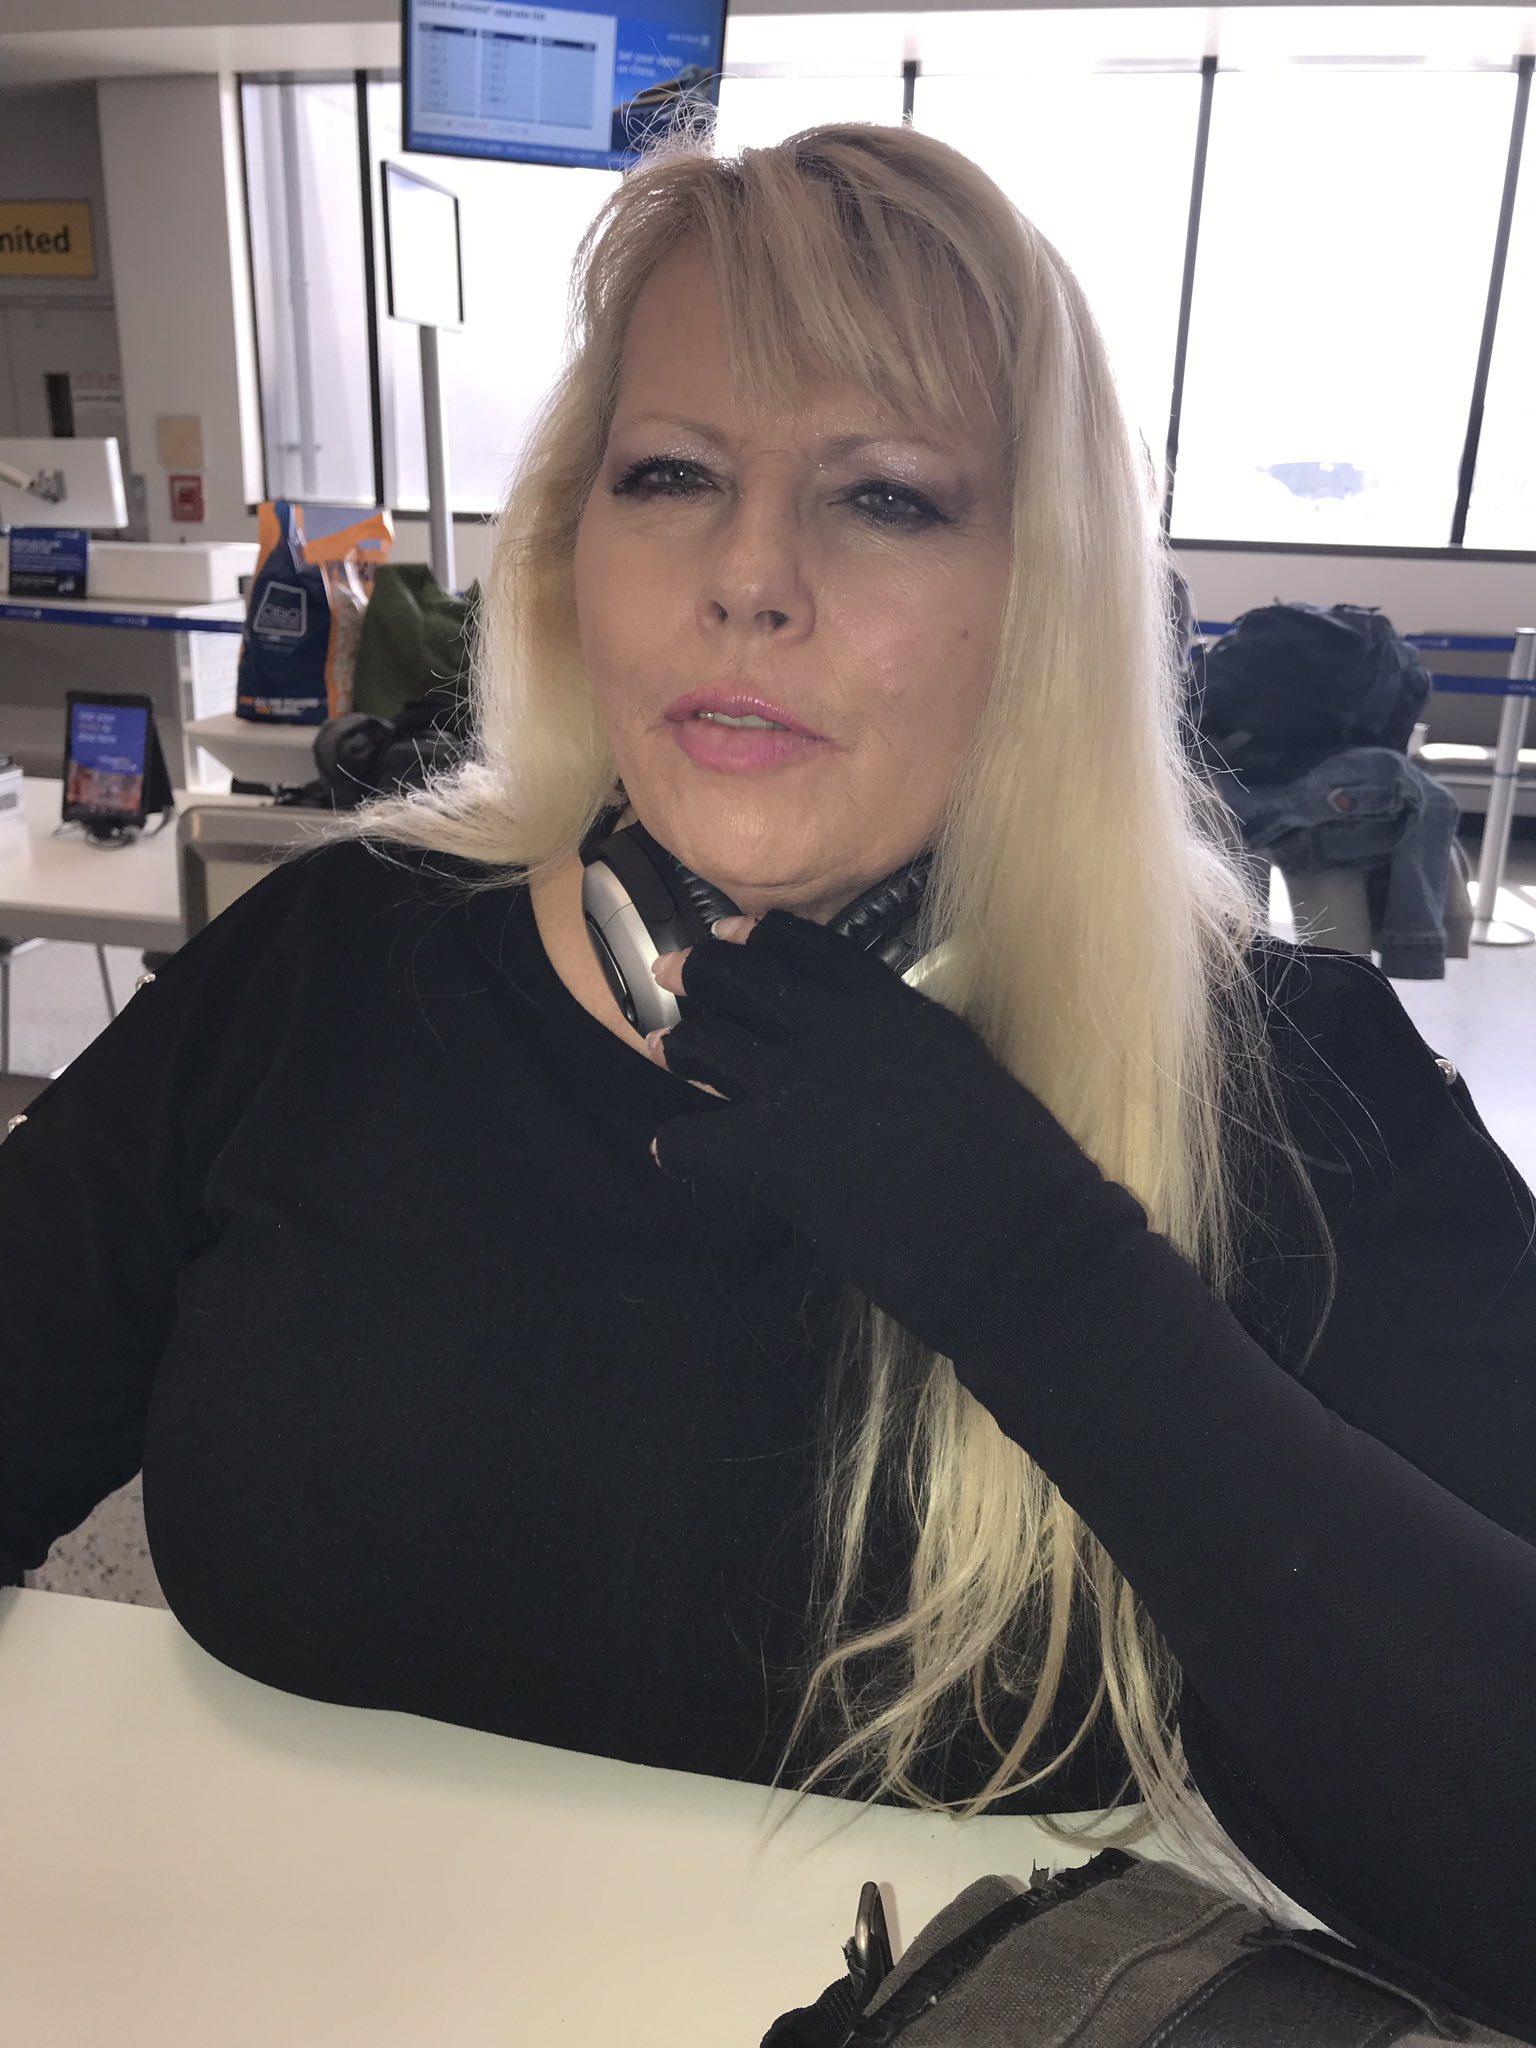 TW Pornstars - 1 pic. Kimberly Kupps. Twitter. Newark